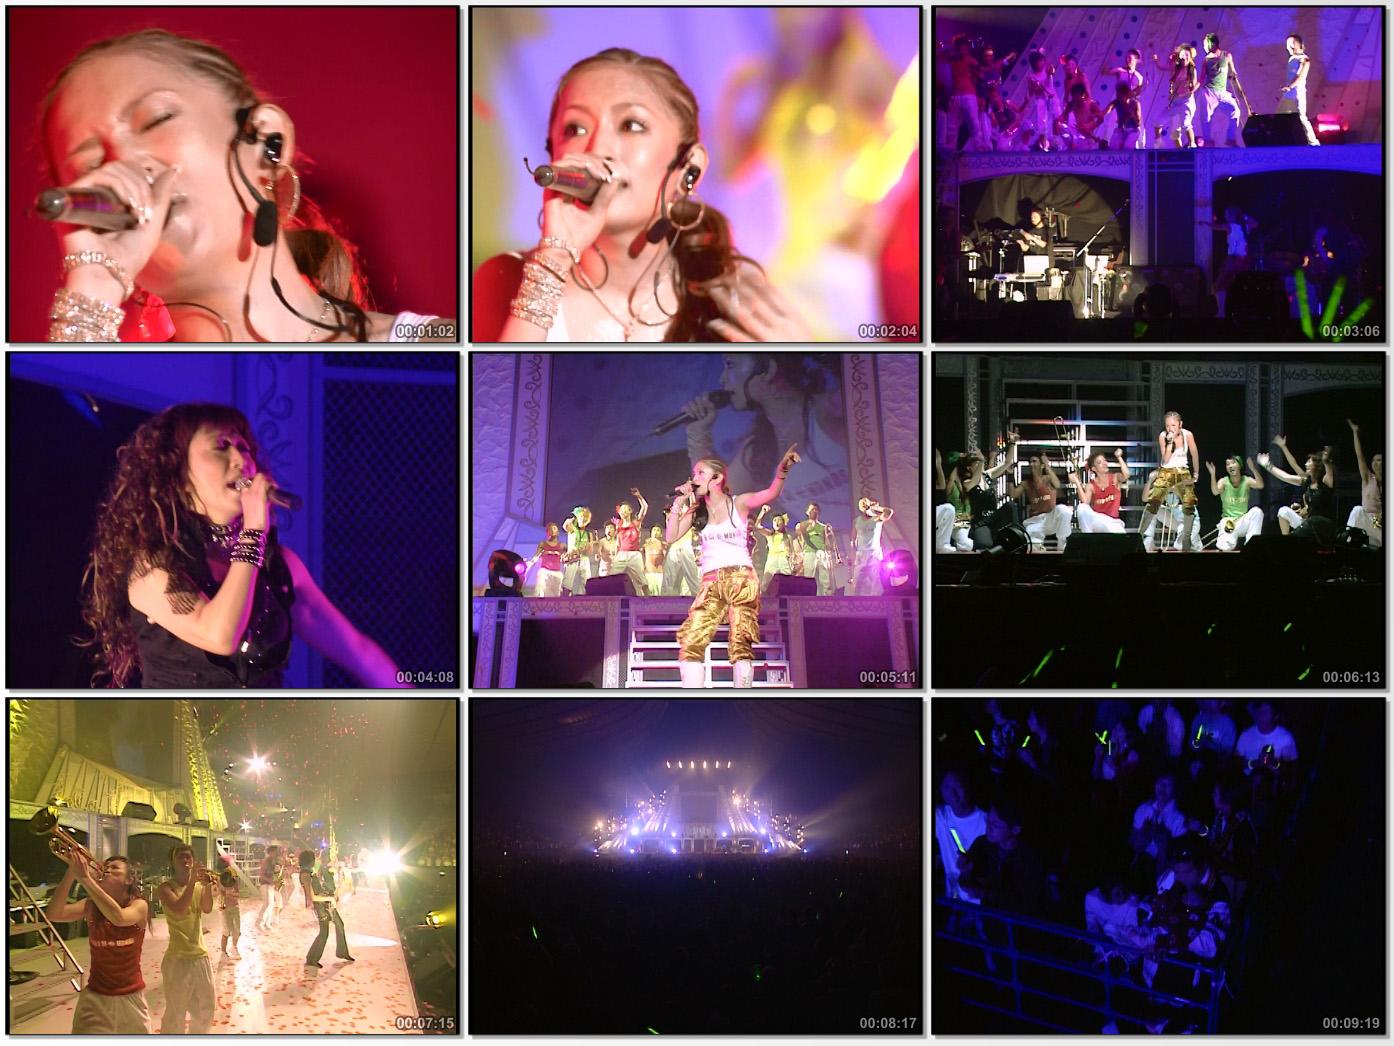 20151104.01.17 Ayumi Hamasaki - Inspire (Countdown Live 2004-2005 A) (JPOP.ru).vob_thumbs_[2015.11.04_03.11.47].jpg